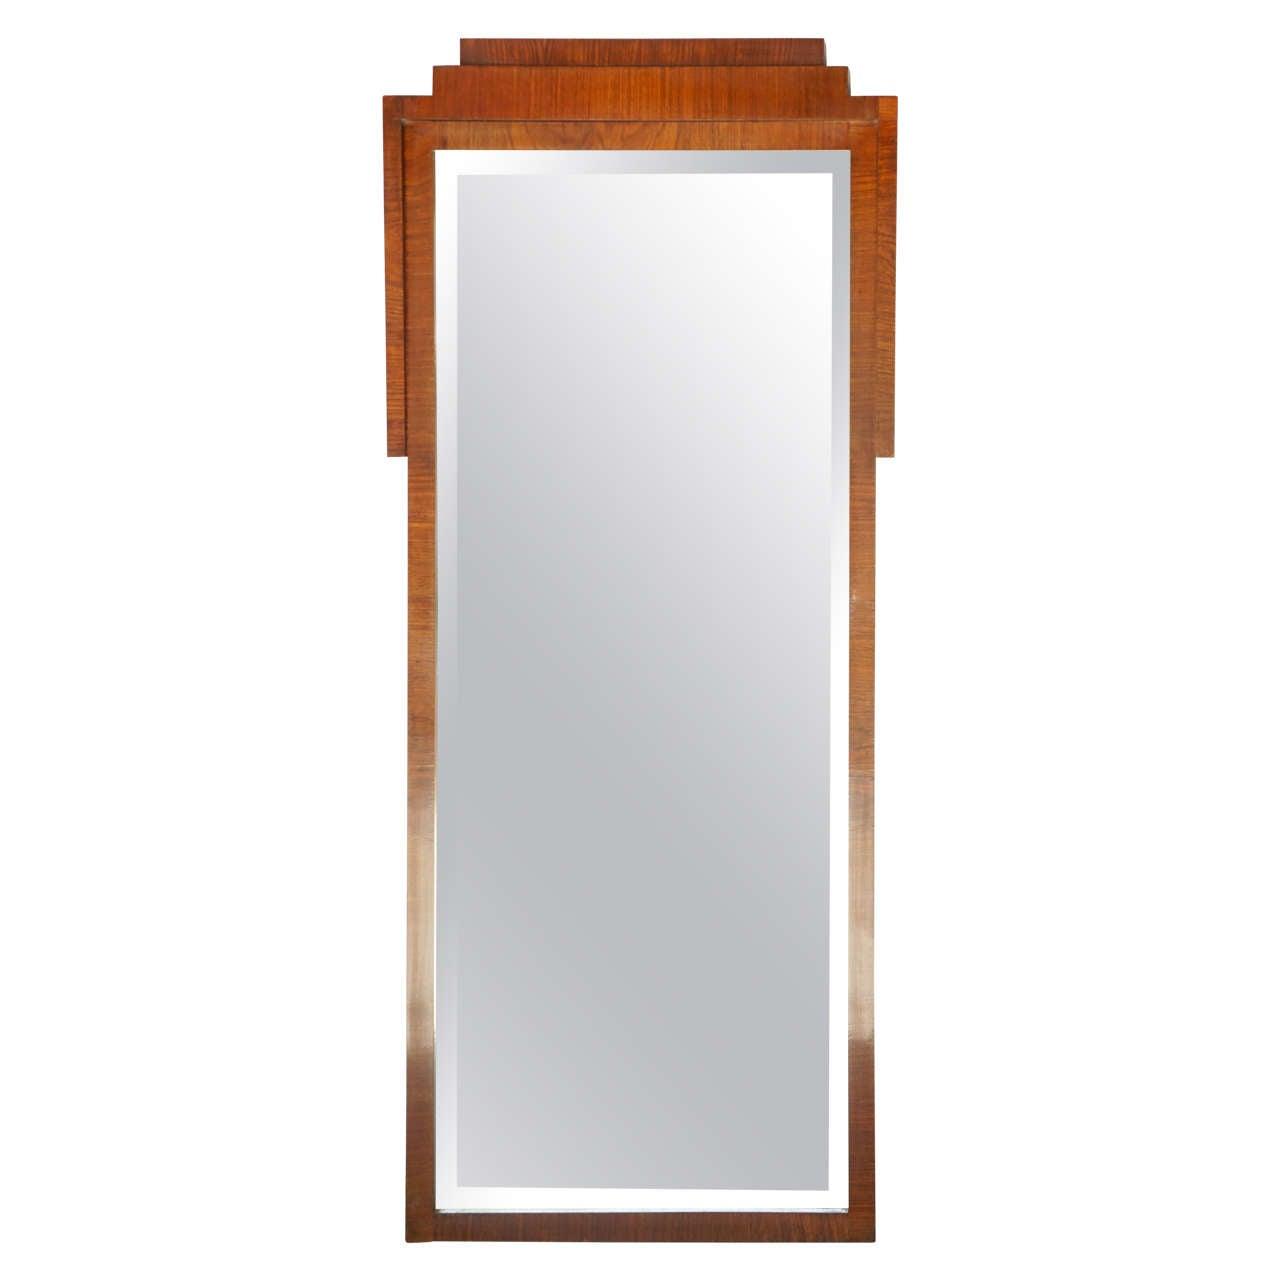 Pier one decorative mirrors